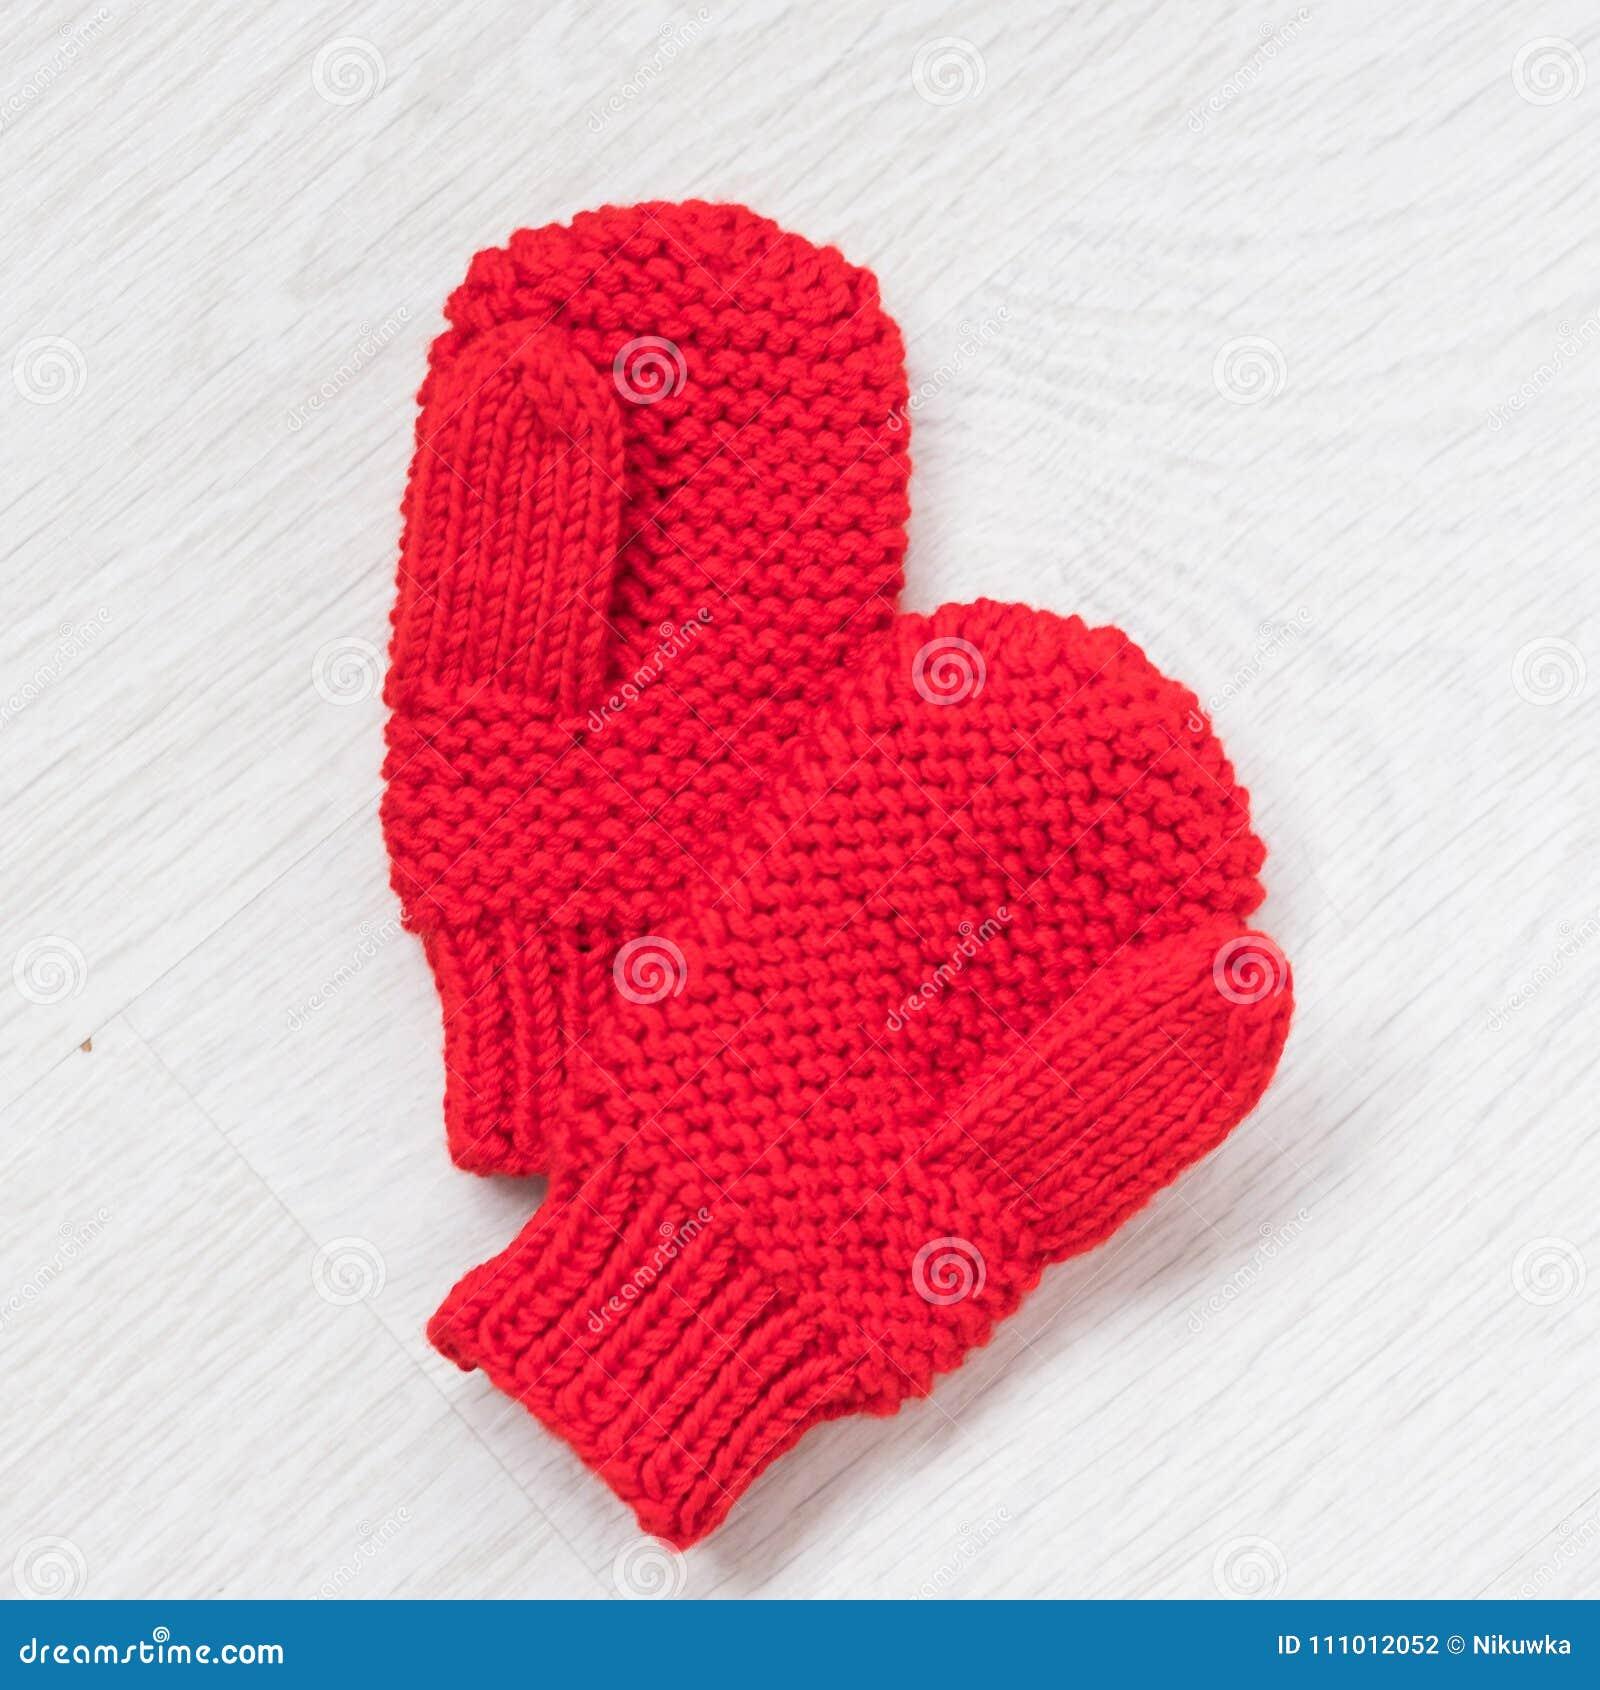 e49377e6b0a Άνετα πλεκτά χειμερινά γάντια Στοκ Εικόνες - εικόνα από μικρός ...